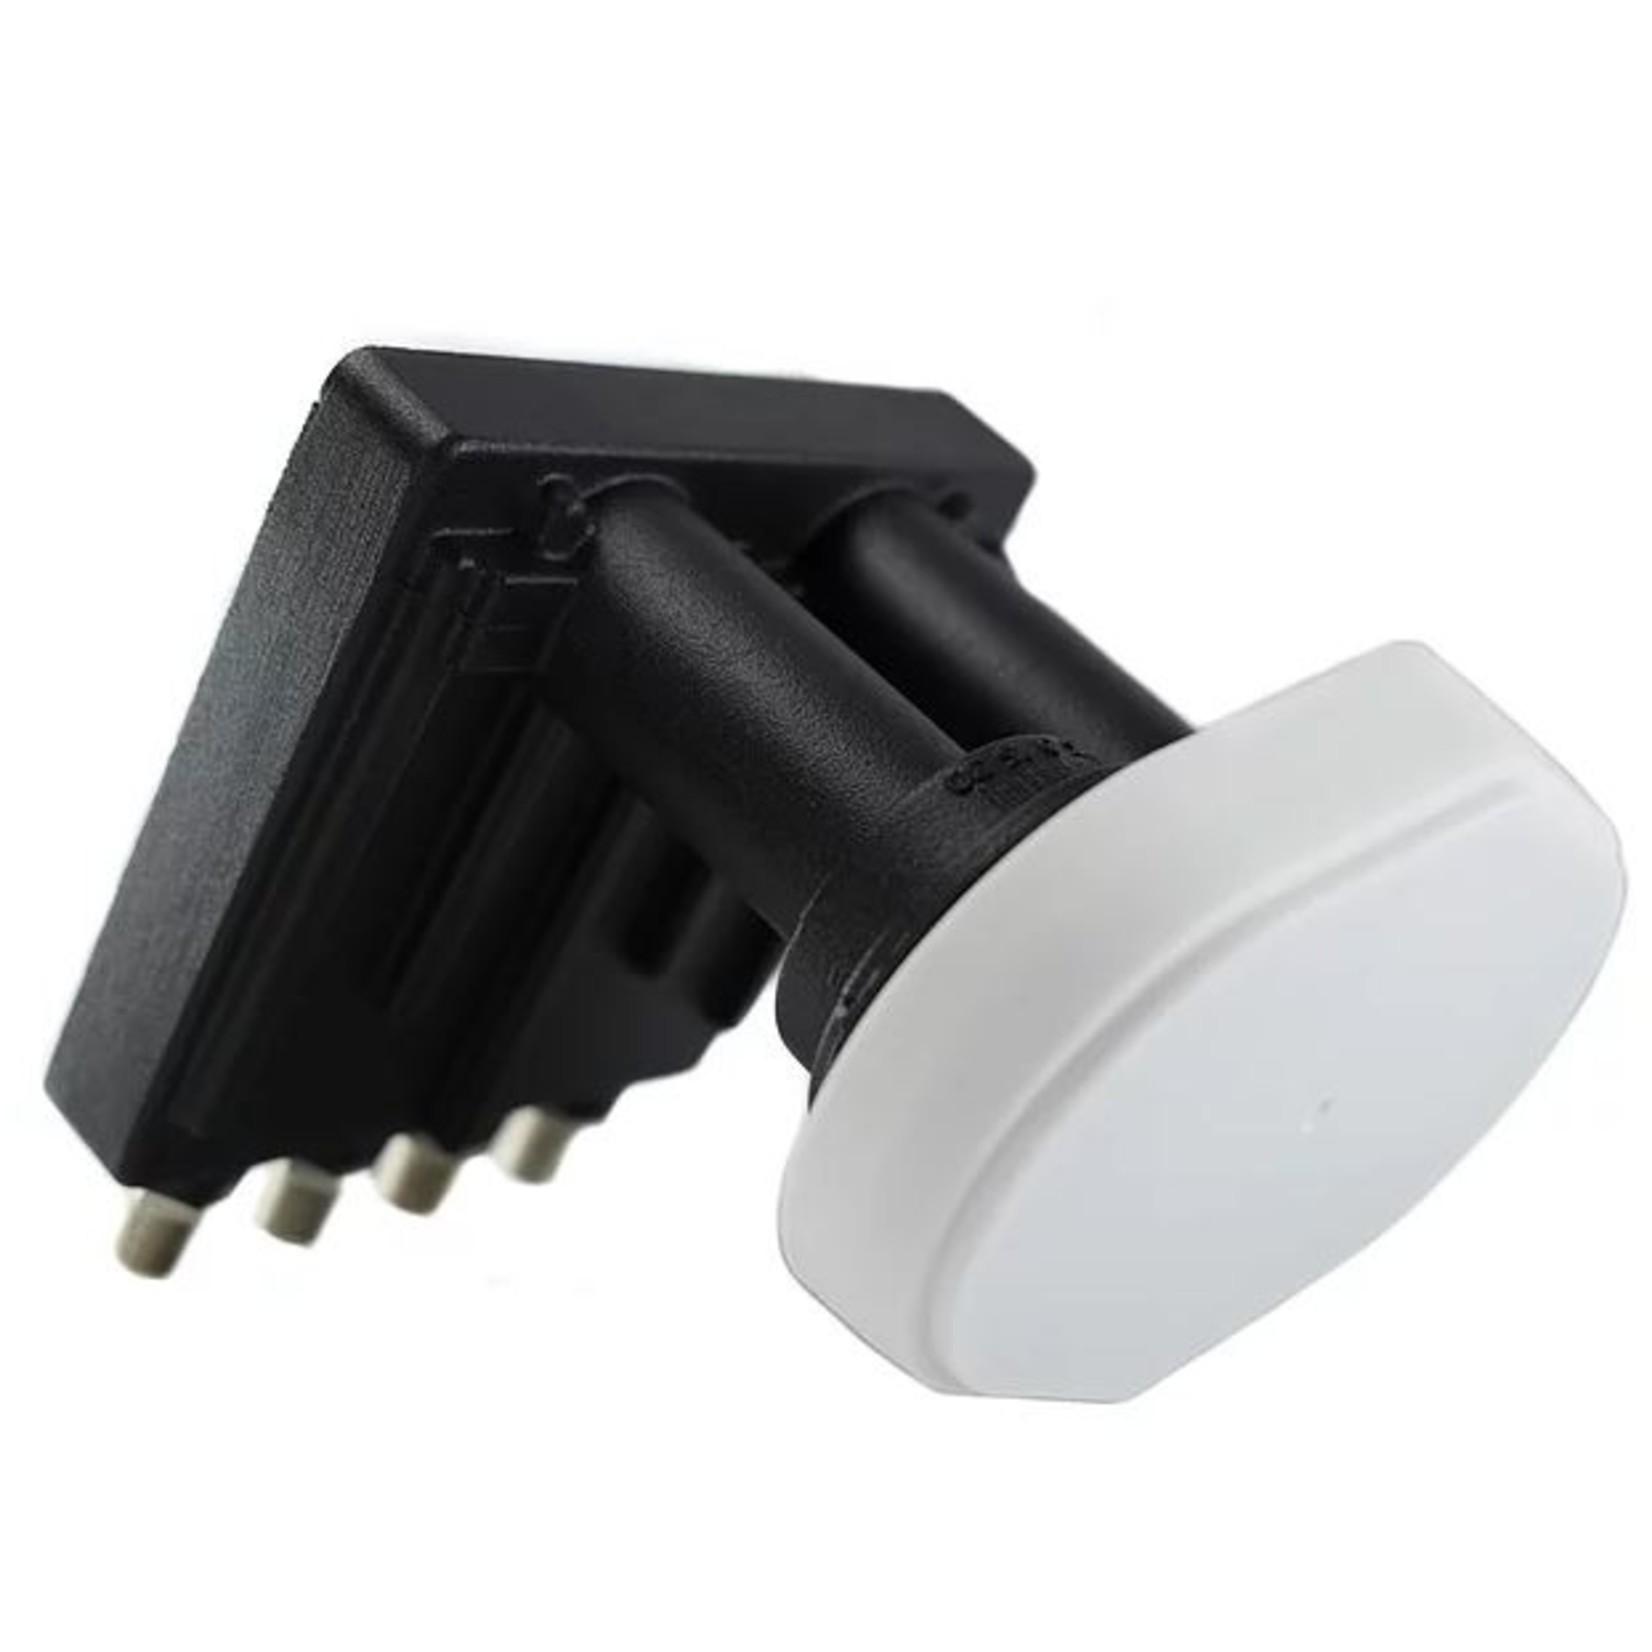 GT LNB DUOBLOC QUAD GT - 4.3° antenne 60cm - 23mm